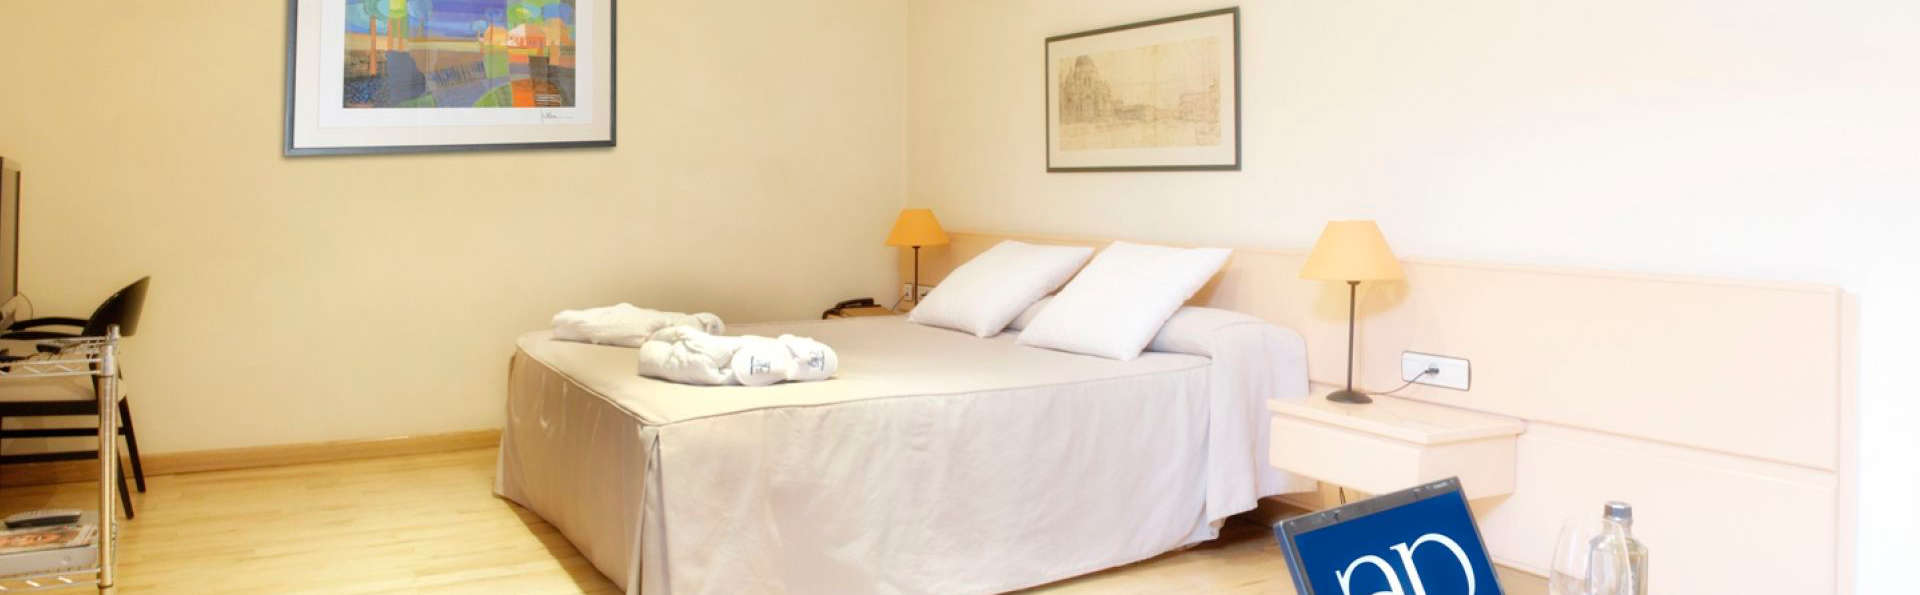 Hotel AR Parquesur - EDIT_room6.jpg